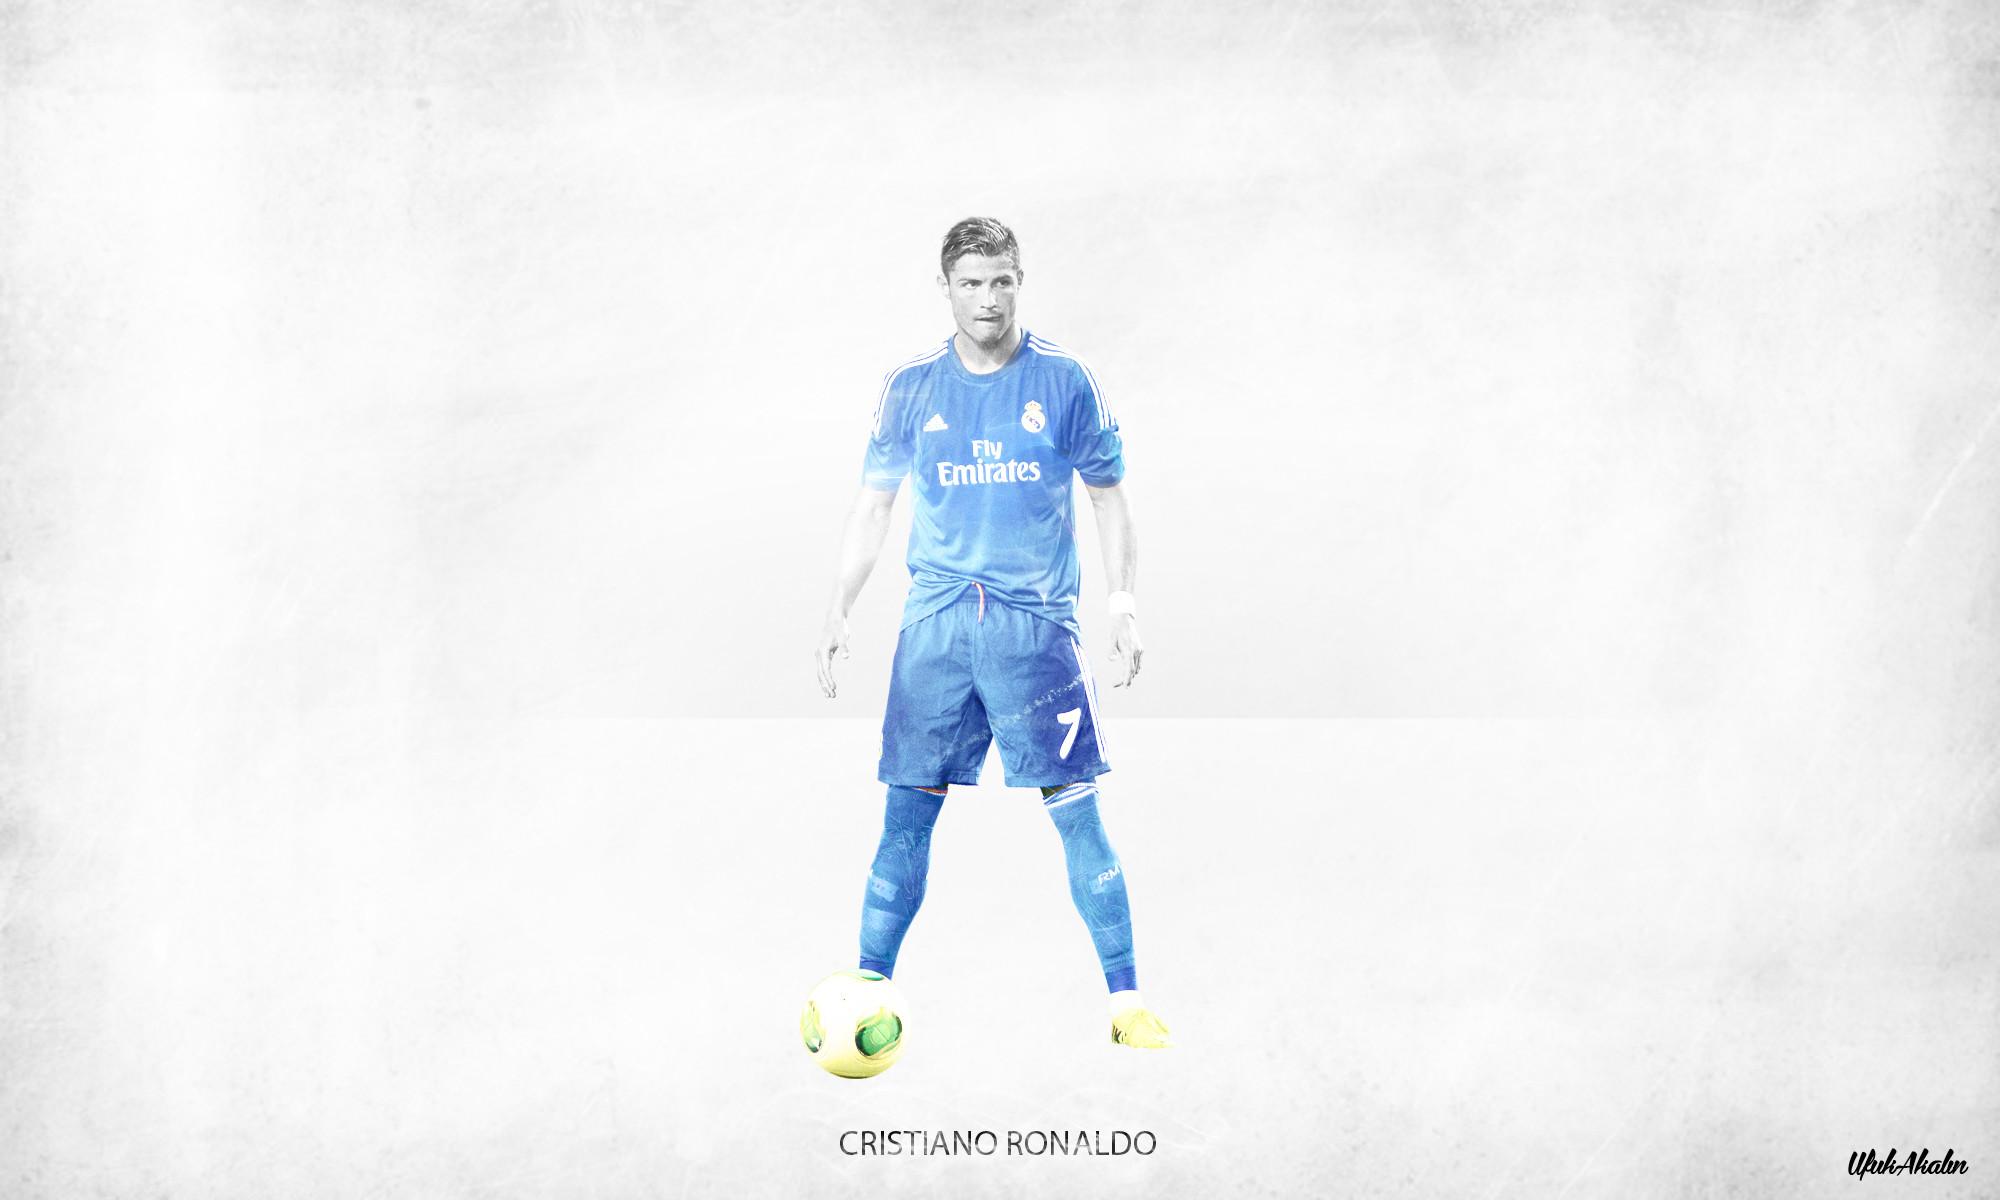 Wallpaper real madrid for windows xp - 2943x1600 Gareth Bale And Cristiano Ronaldo Wallpaper 2015 7